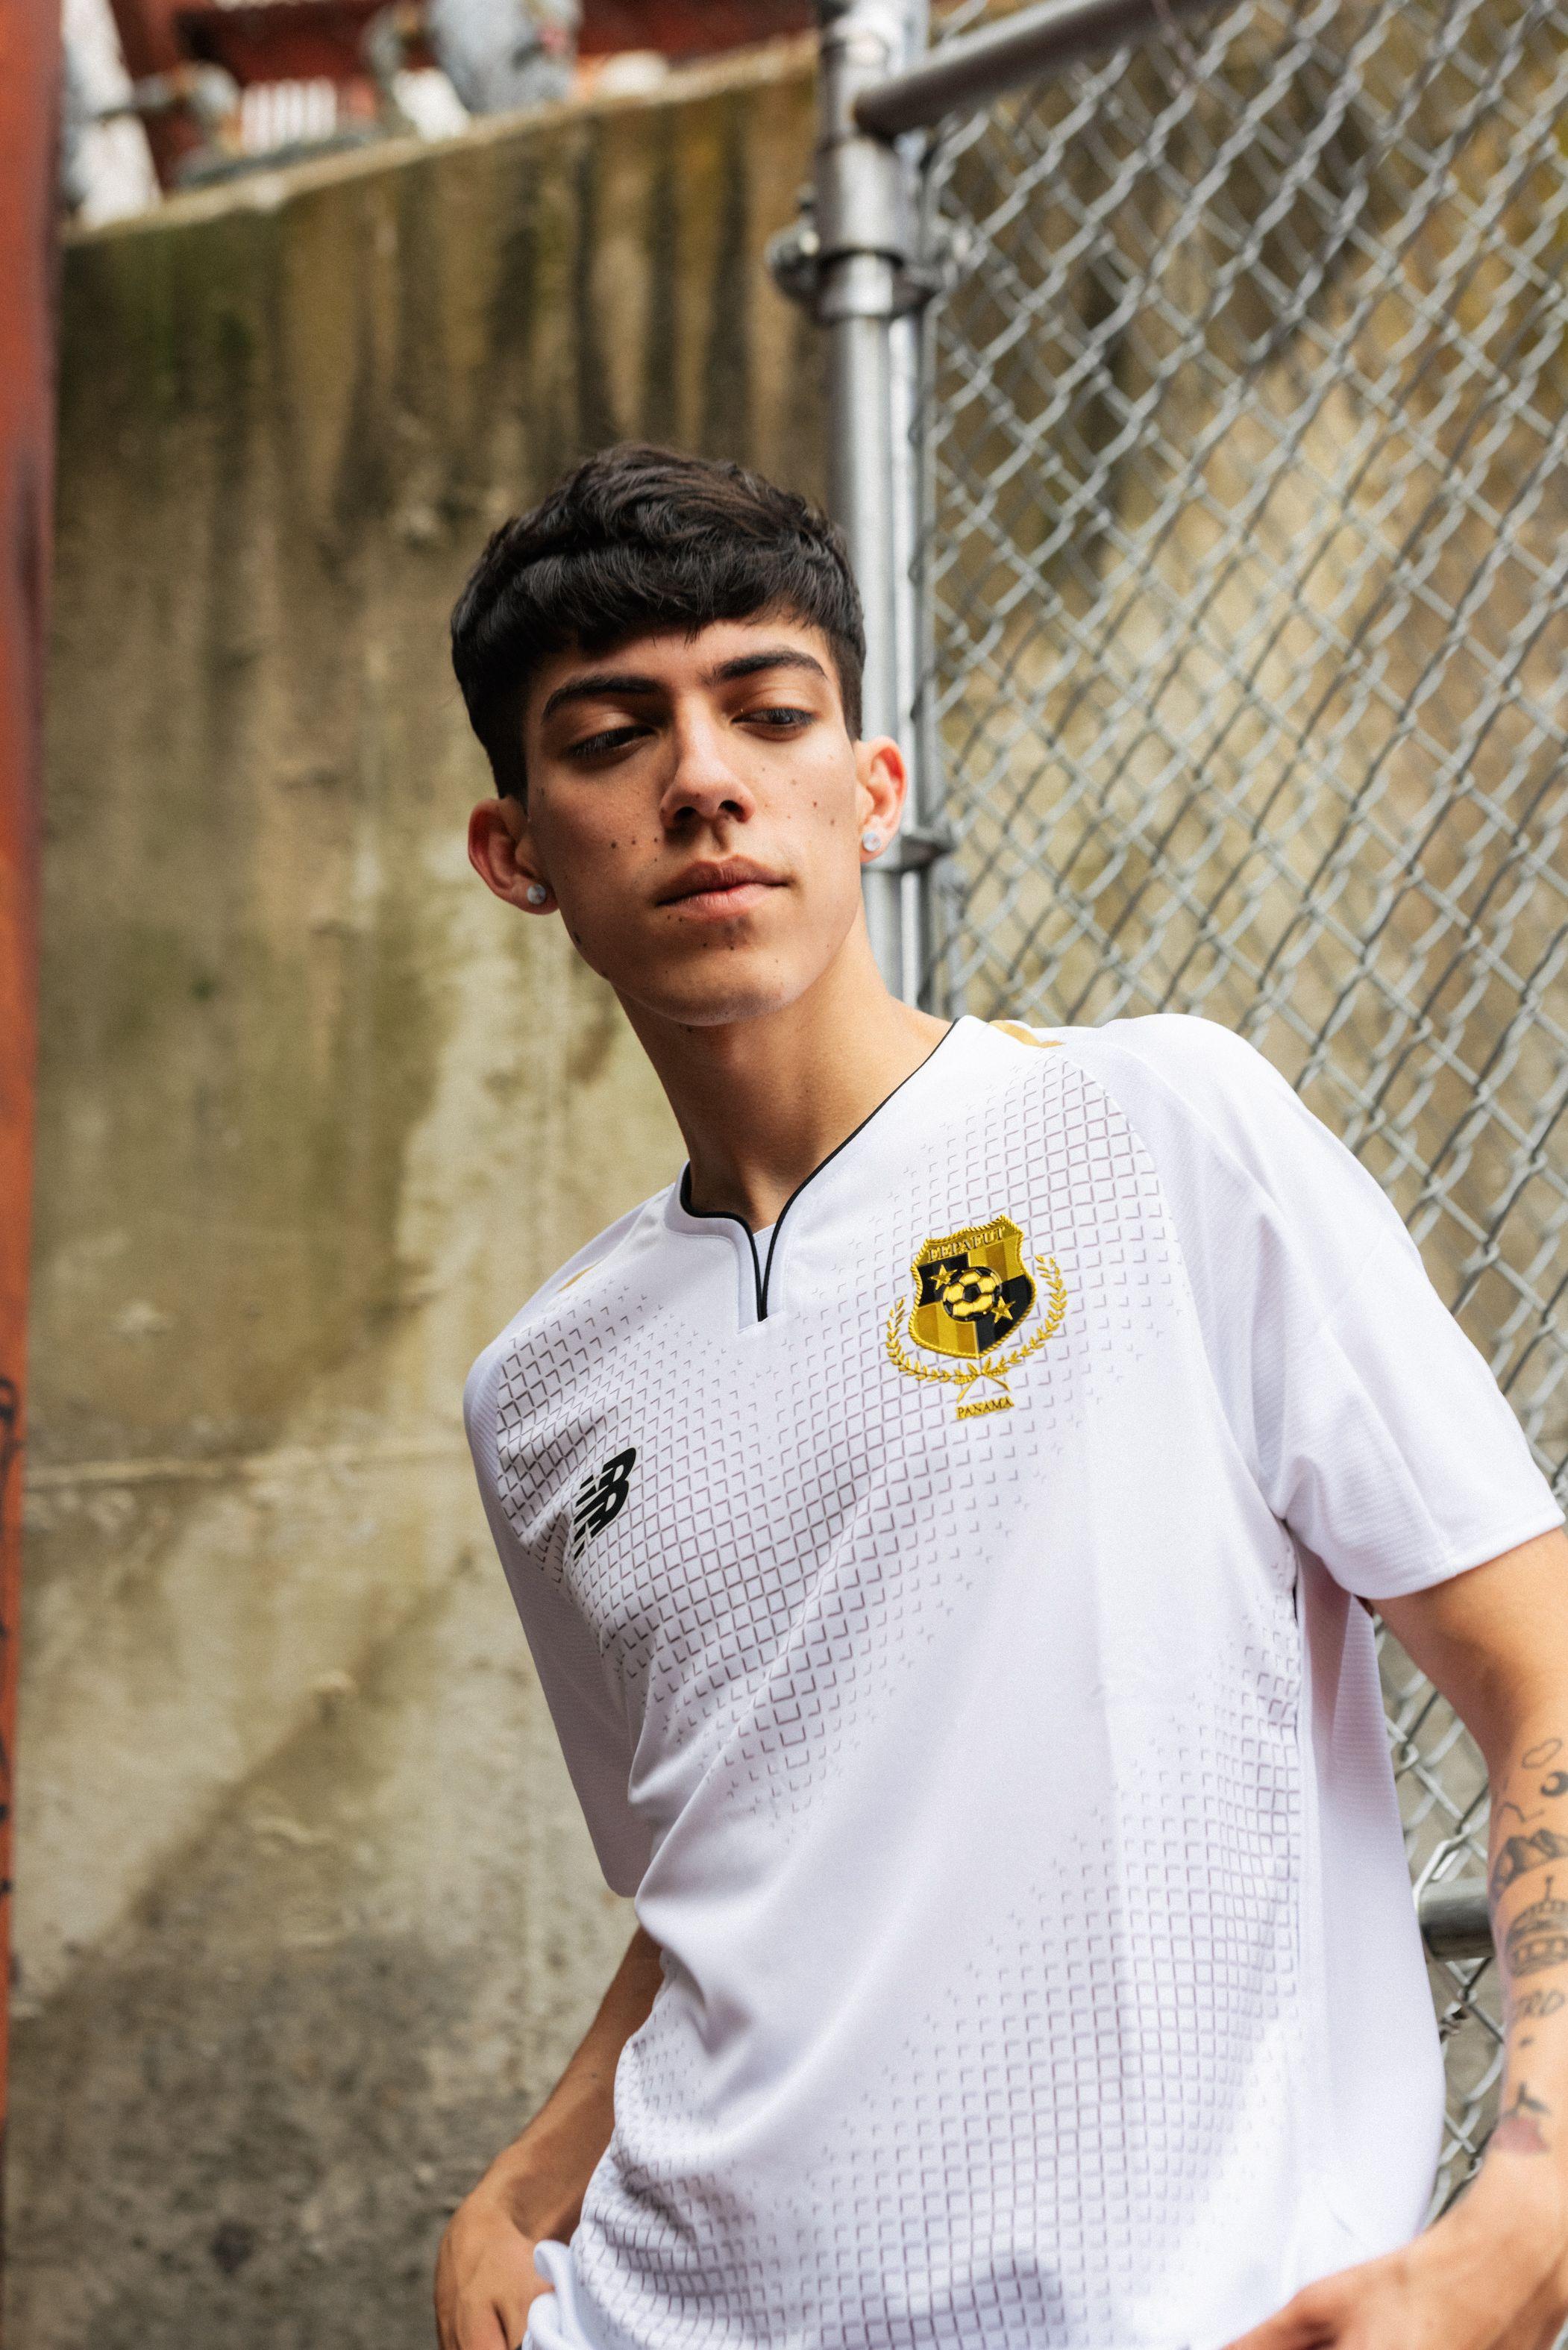 Panama 2019 Gold Cup Jersey by New Balance | 2019/20